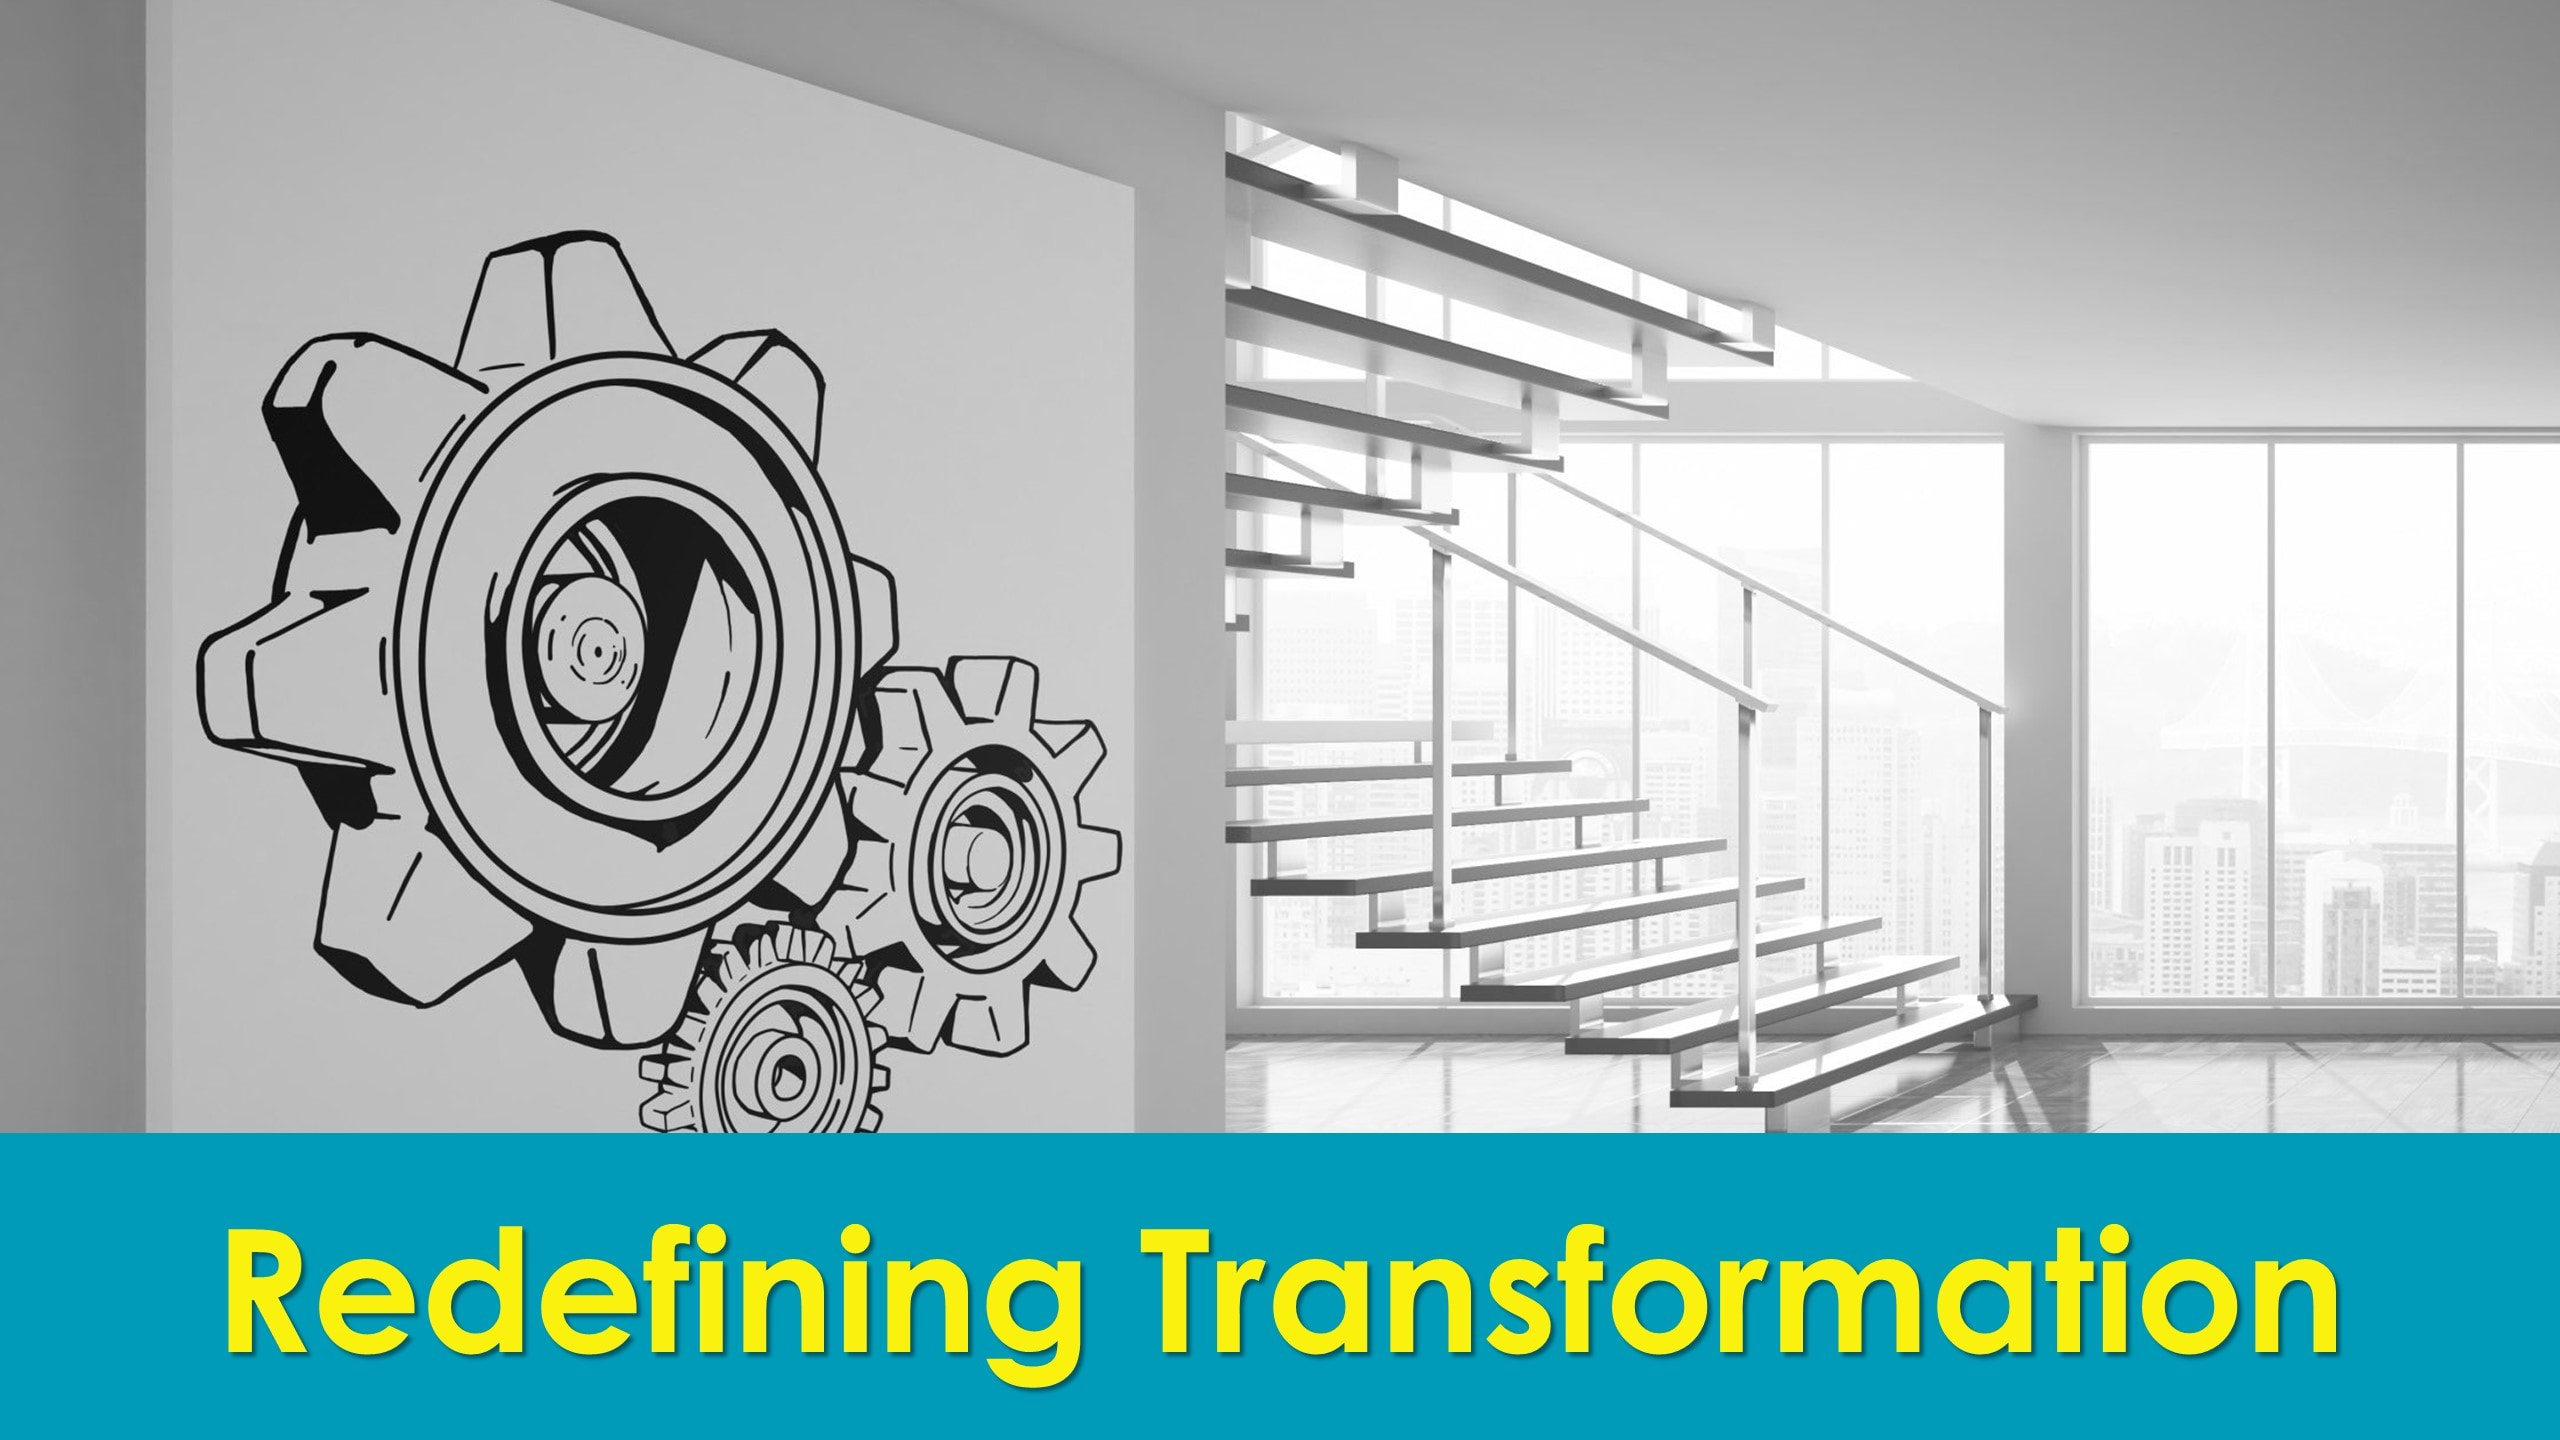 Redefining Transformation Slide 1